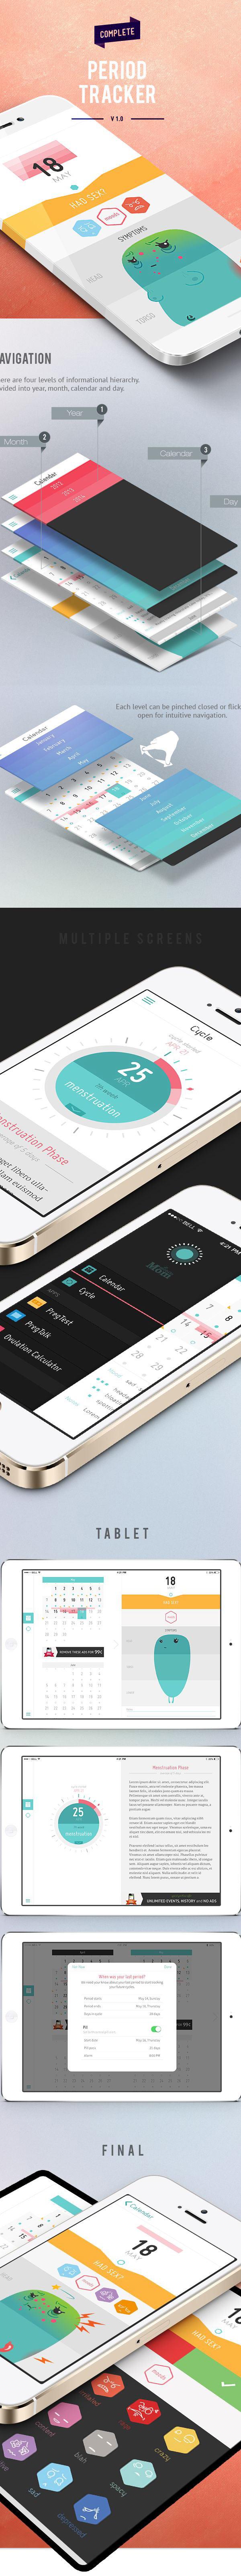 Period Tracker app on iOS